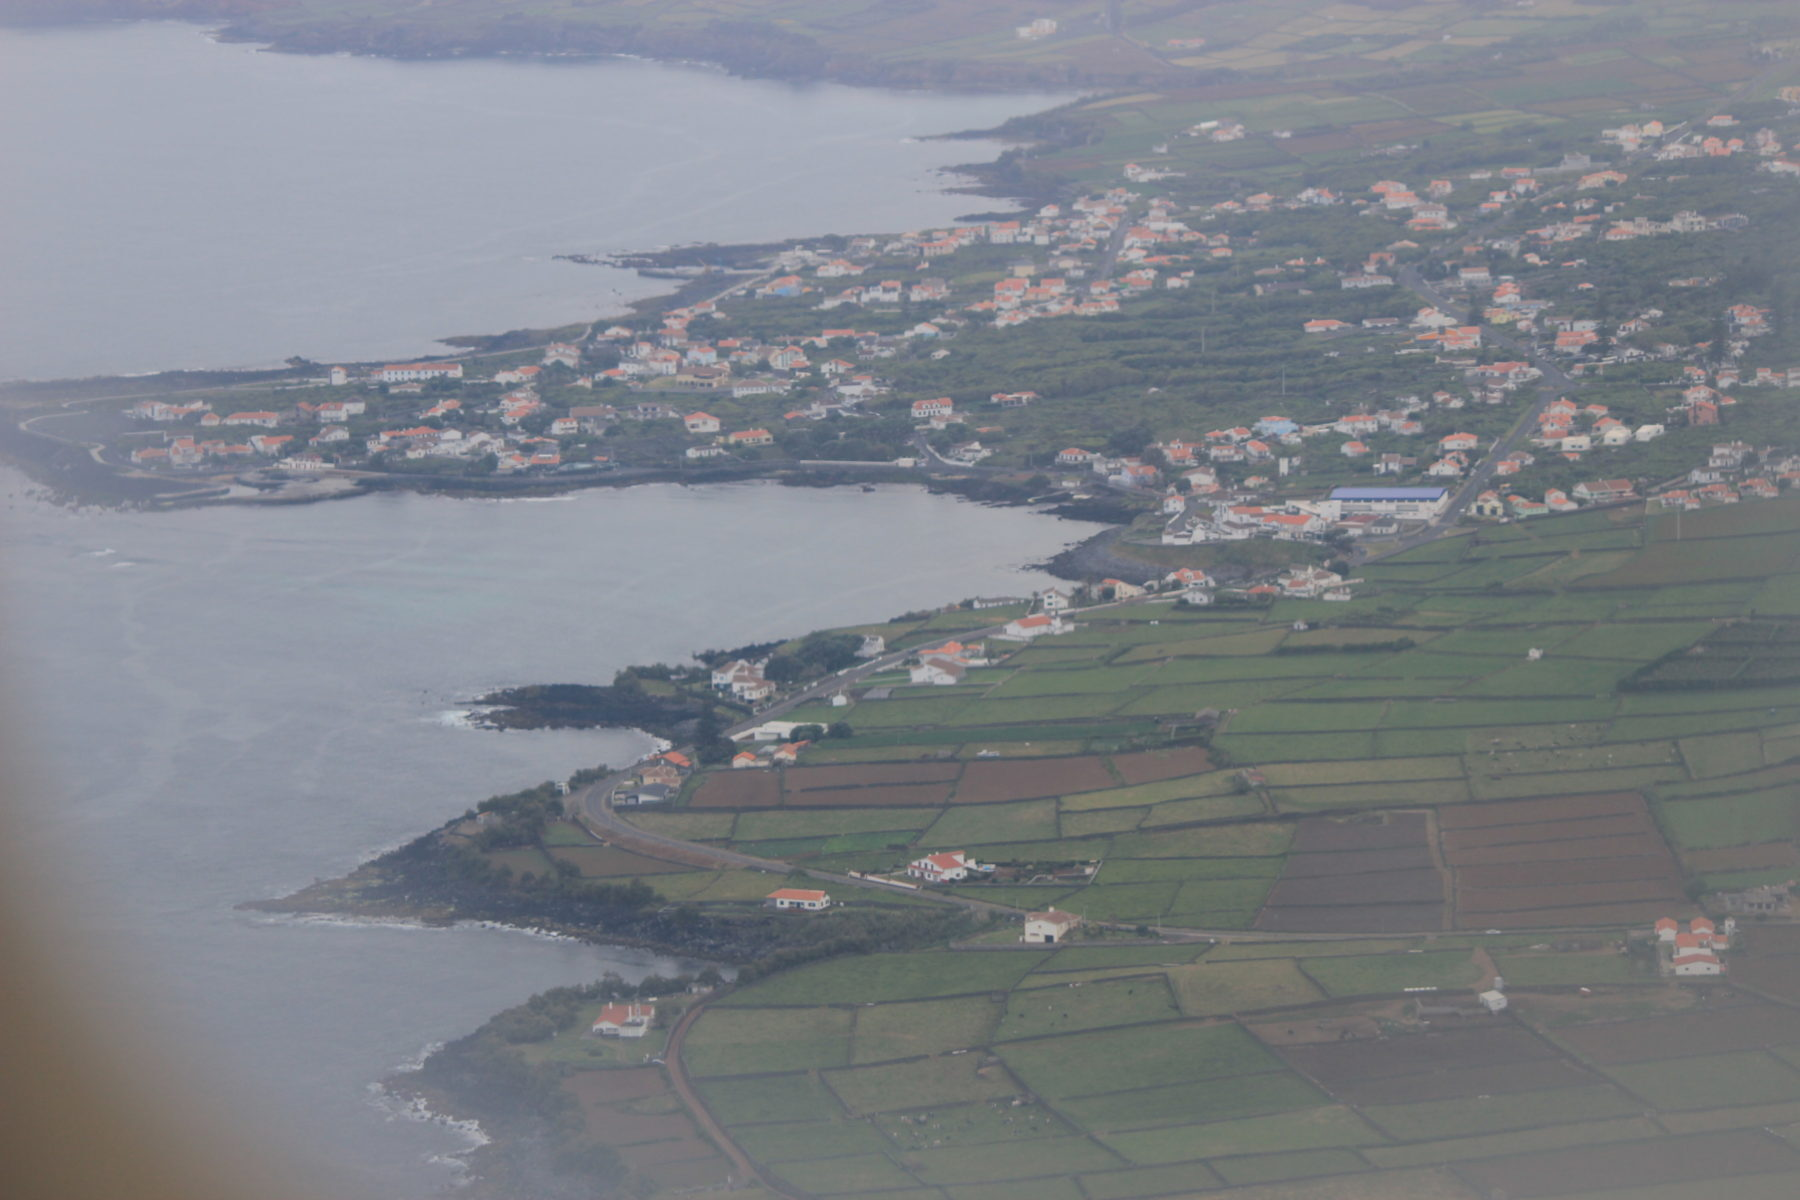 Descoberta dos Açores